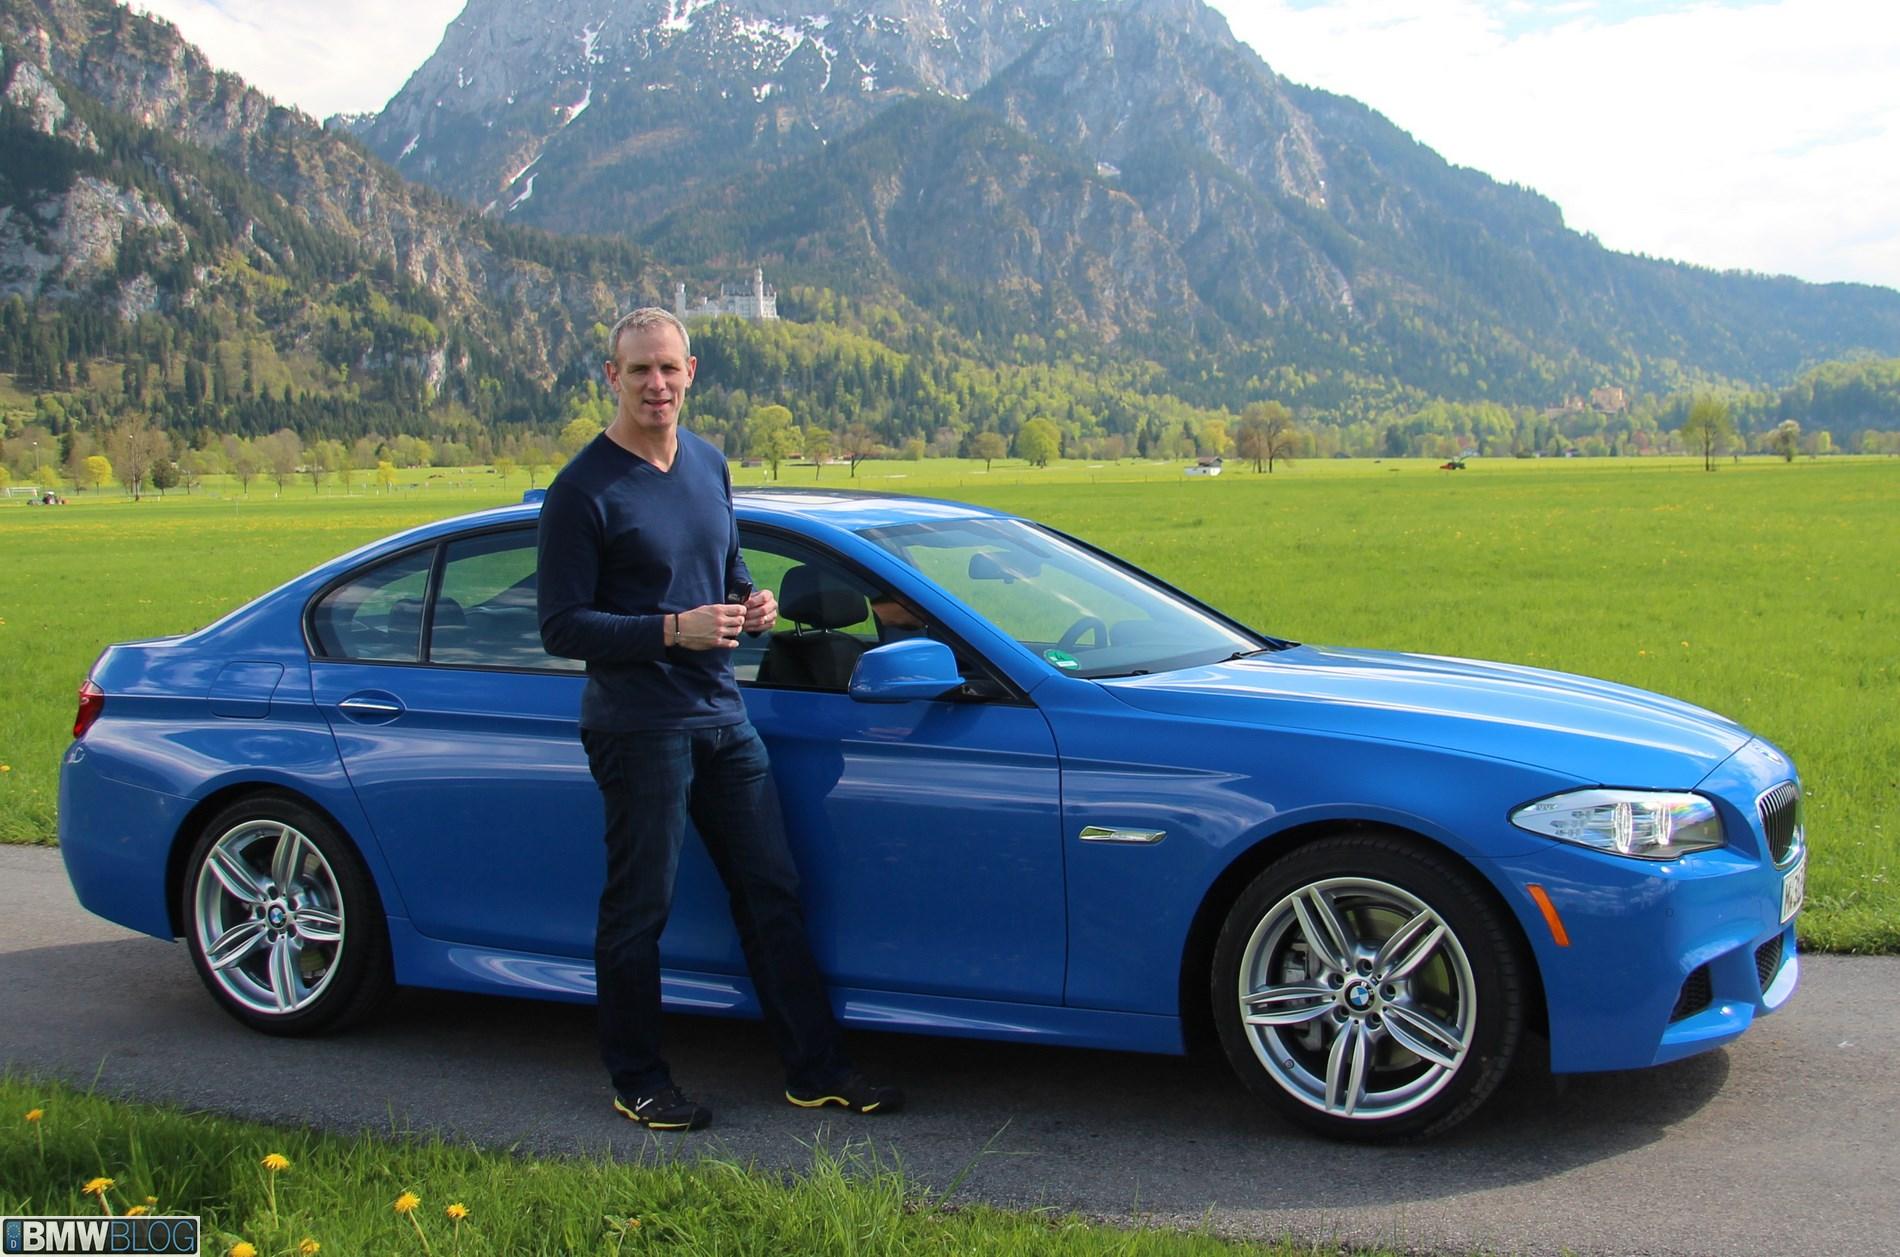 BMW European Delivery of BMW 535i Santorini Blue